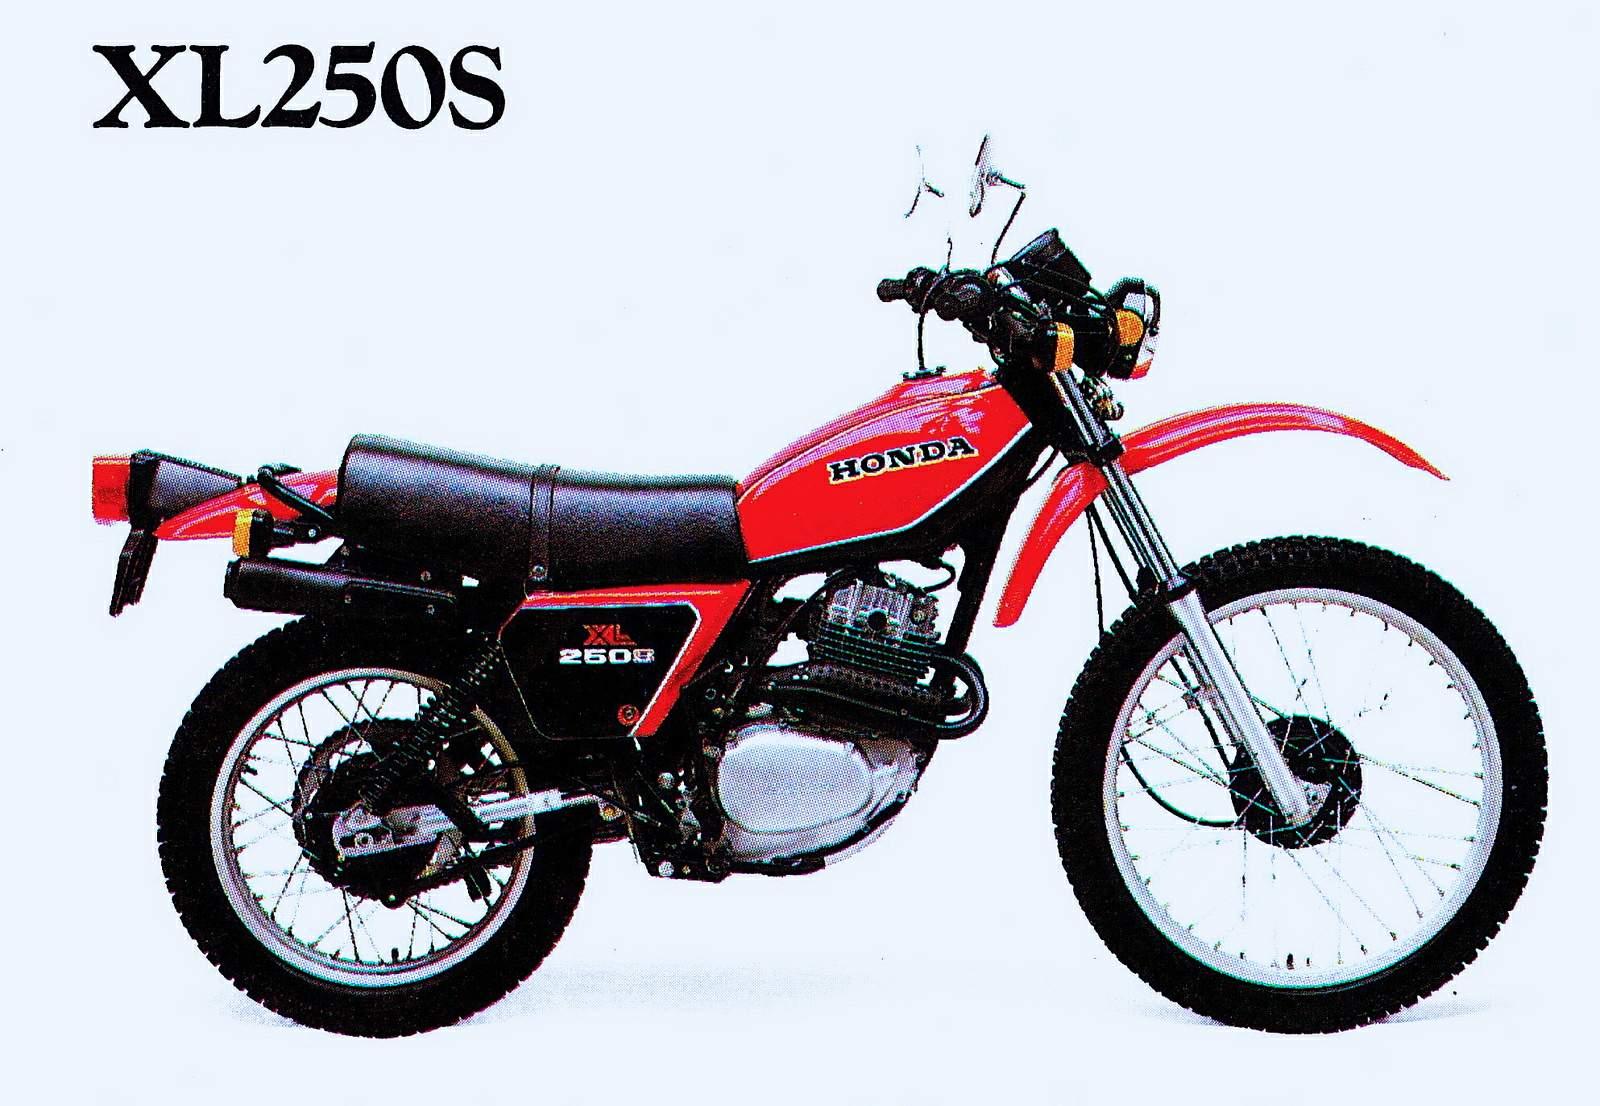 Dr 2811 Wiring Harness Diagram As Well 1974 Honda Xl 250 Wiring Diagram On 3 Free Diagram